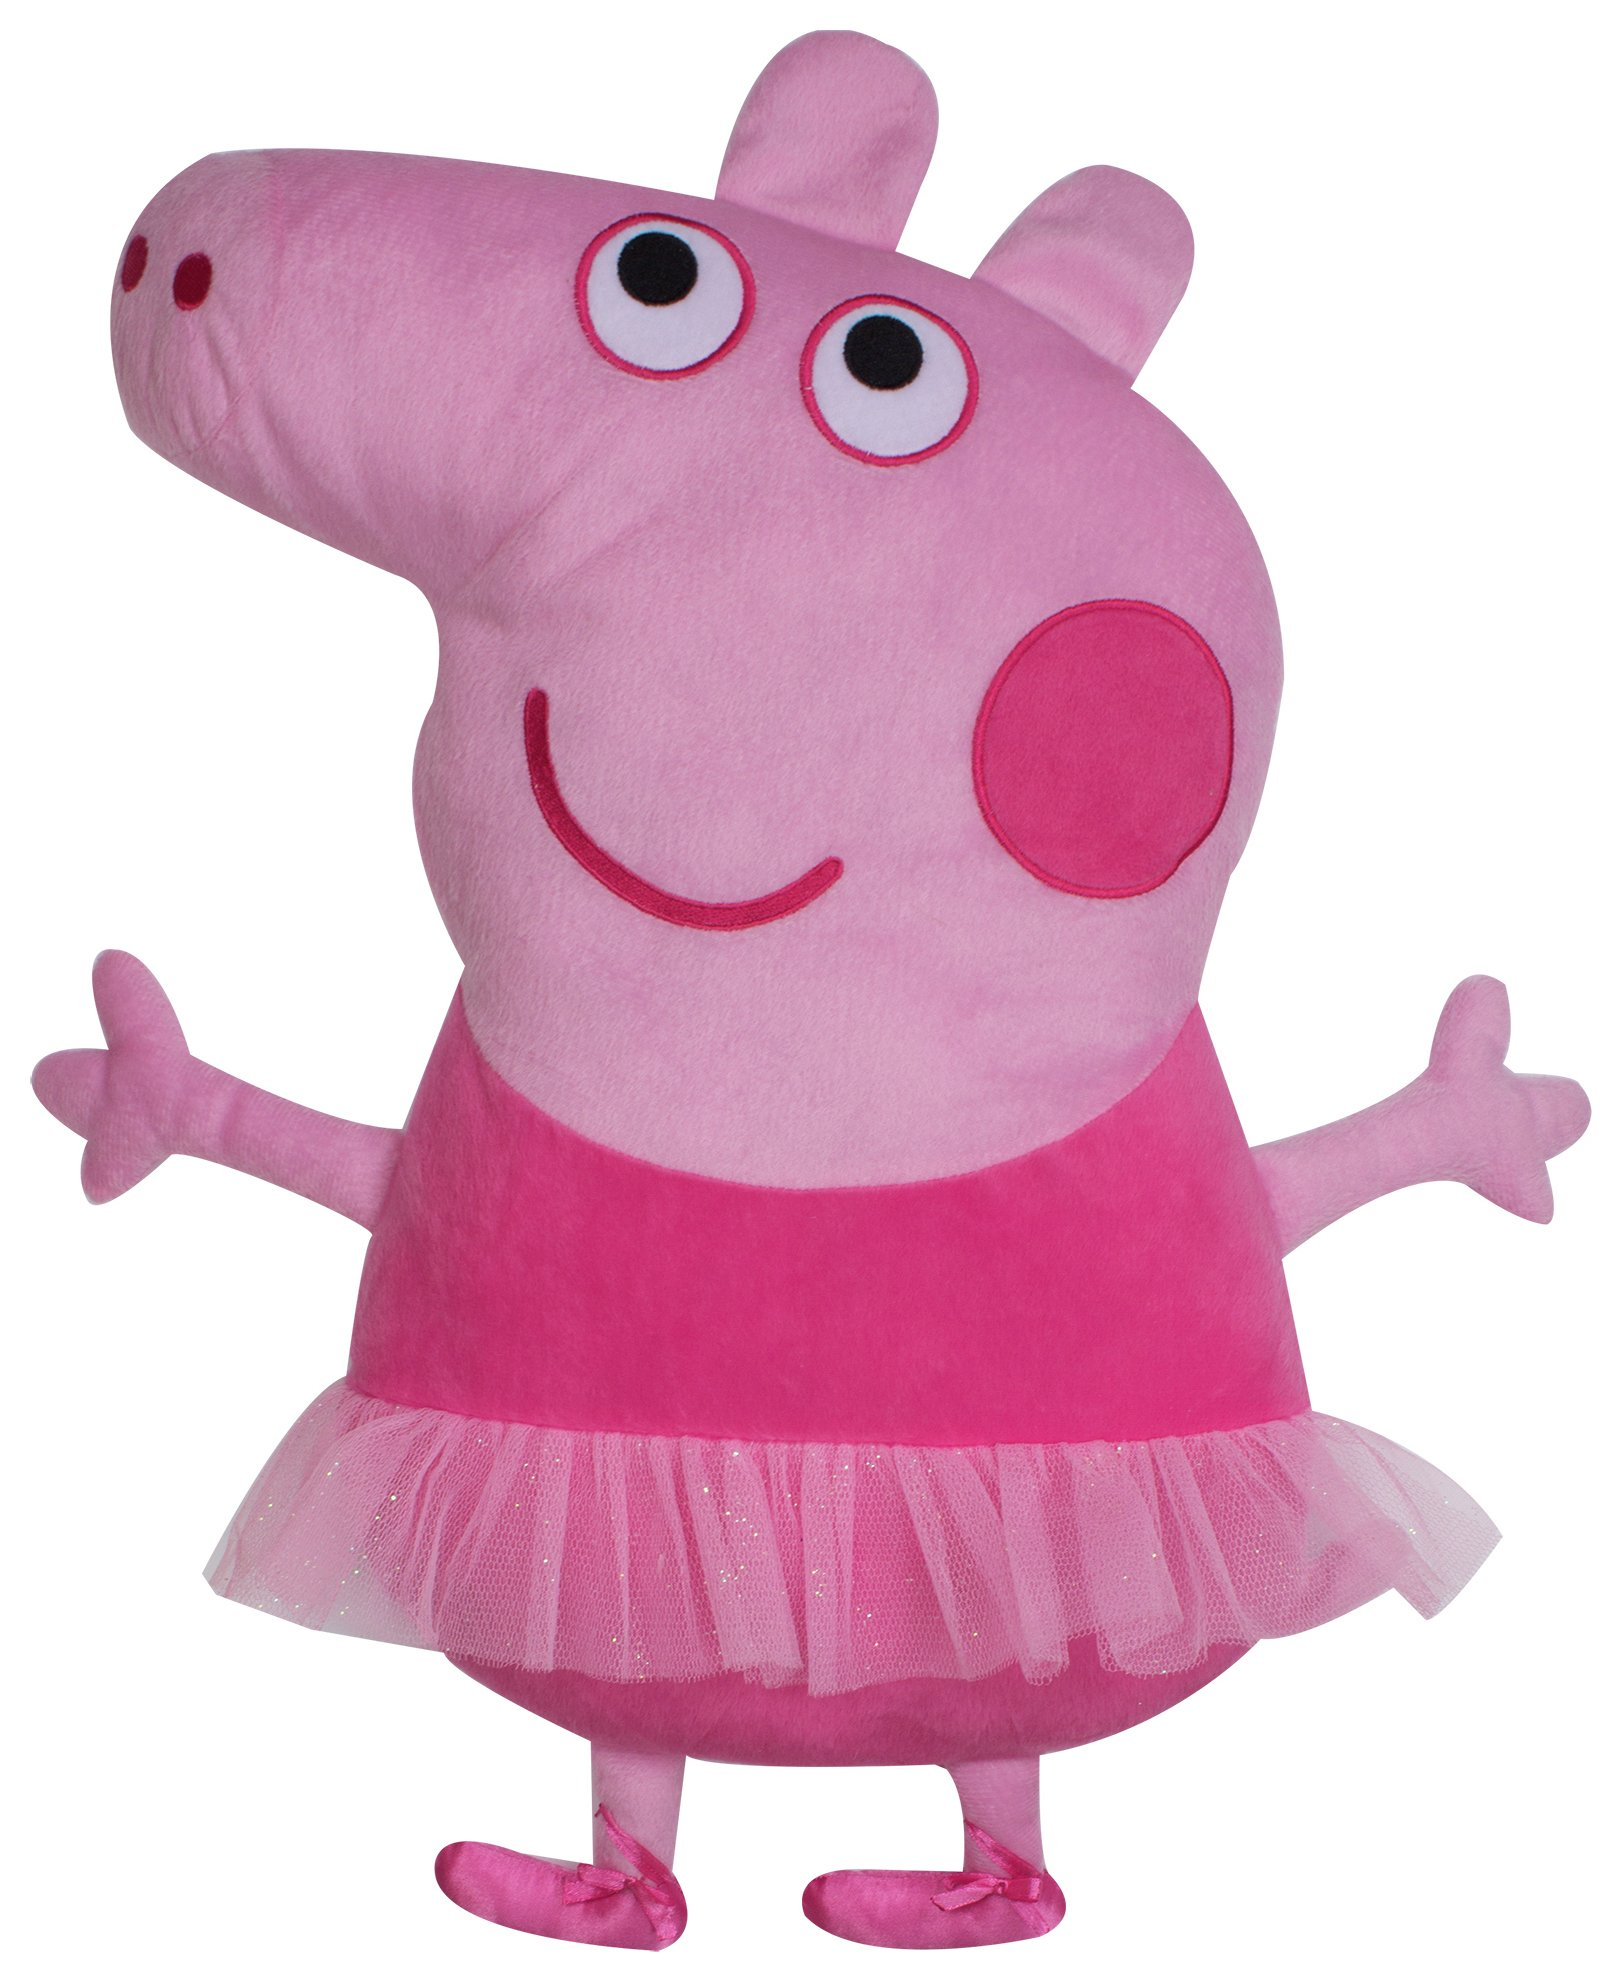 Peppa Pig Ballerina Plush Cushion